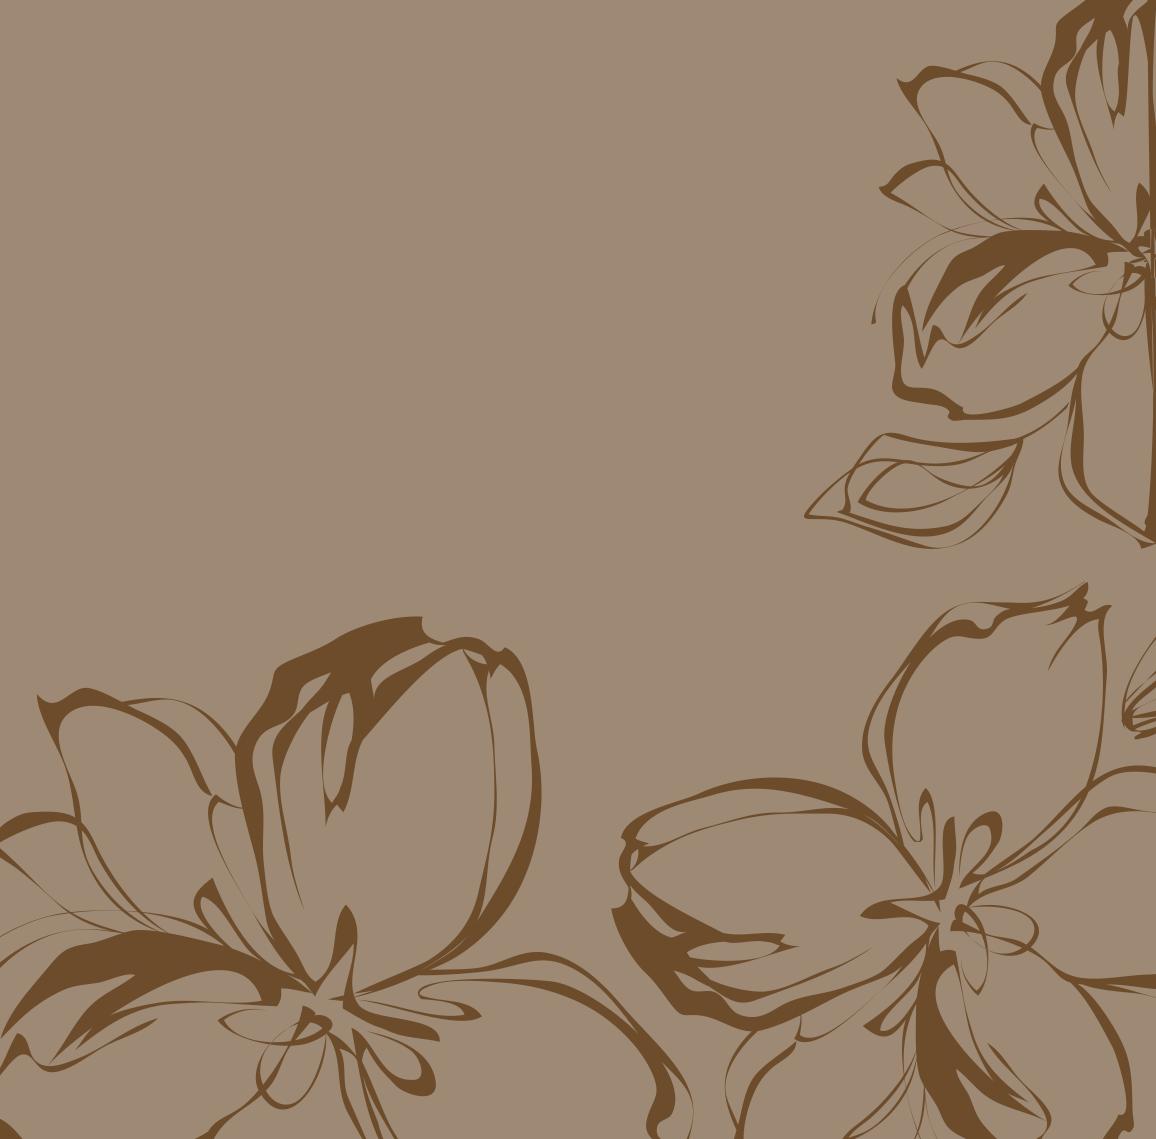 TOVAGLIOLO FLOWERS TORTORA 40X40